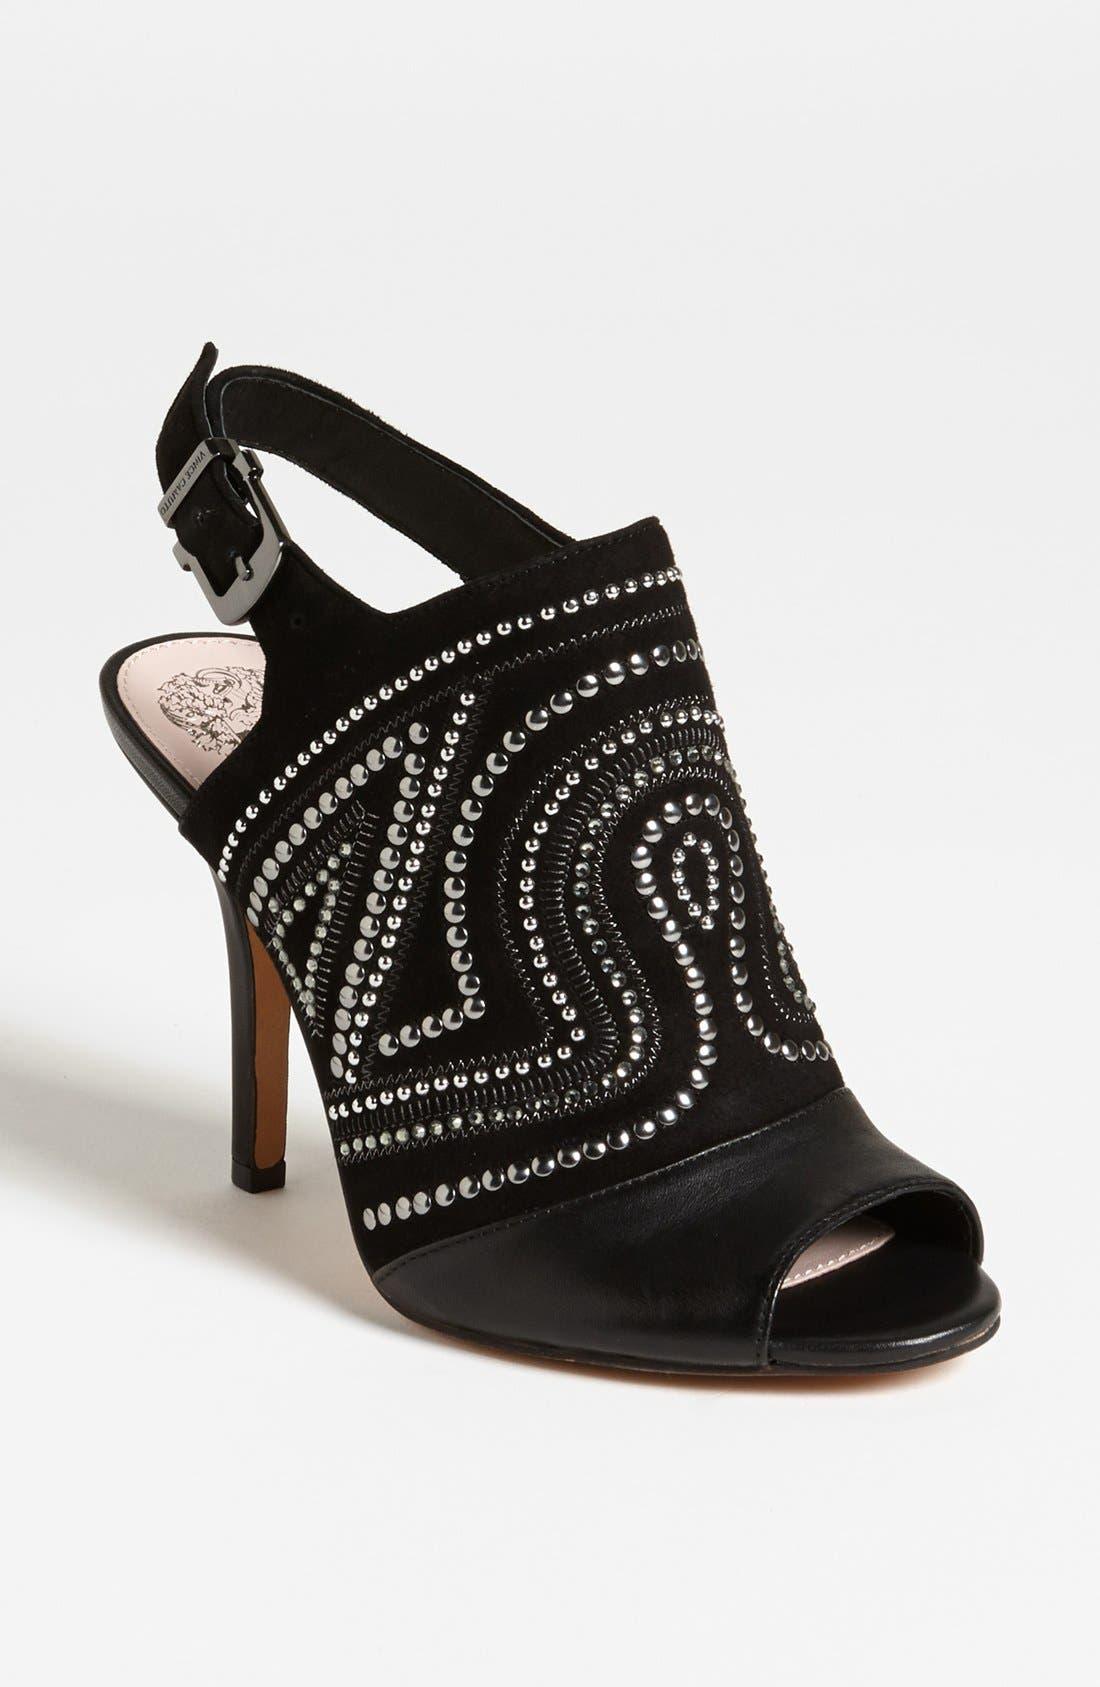 Alternate Image 1 Selected - Vince Camuto 'Yolana' Sandal